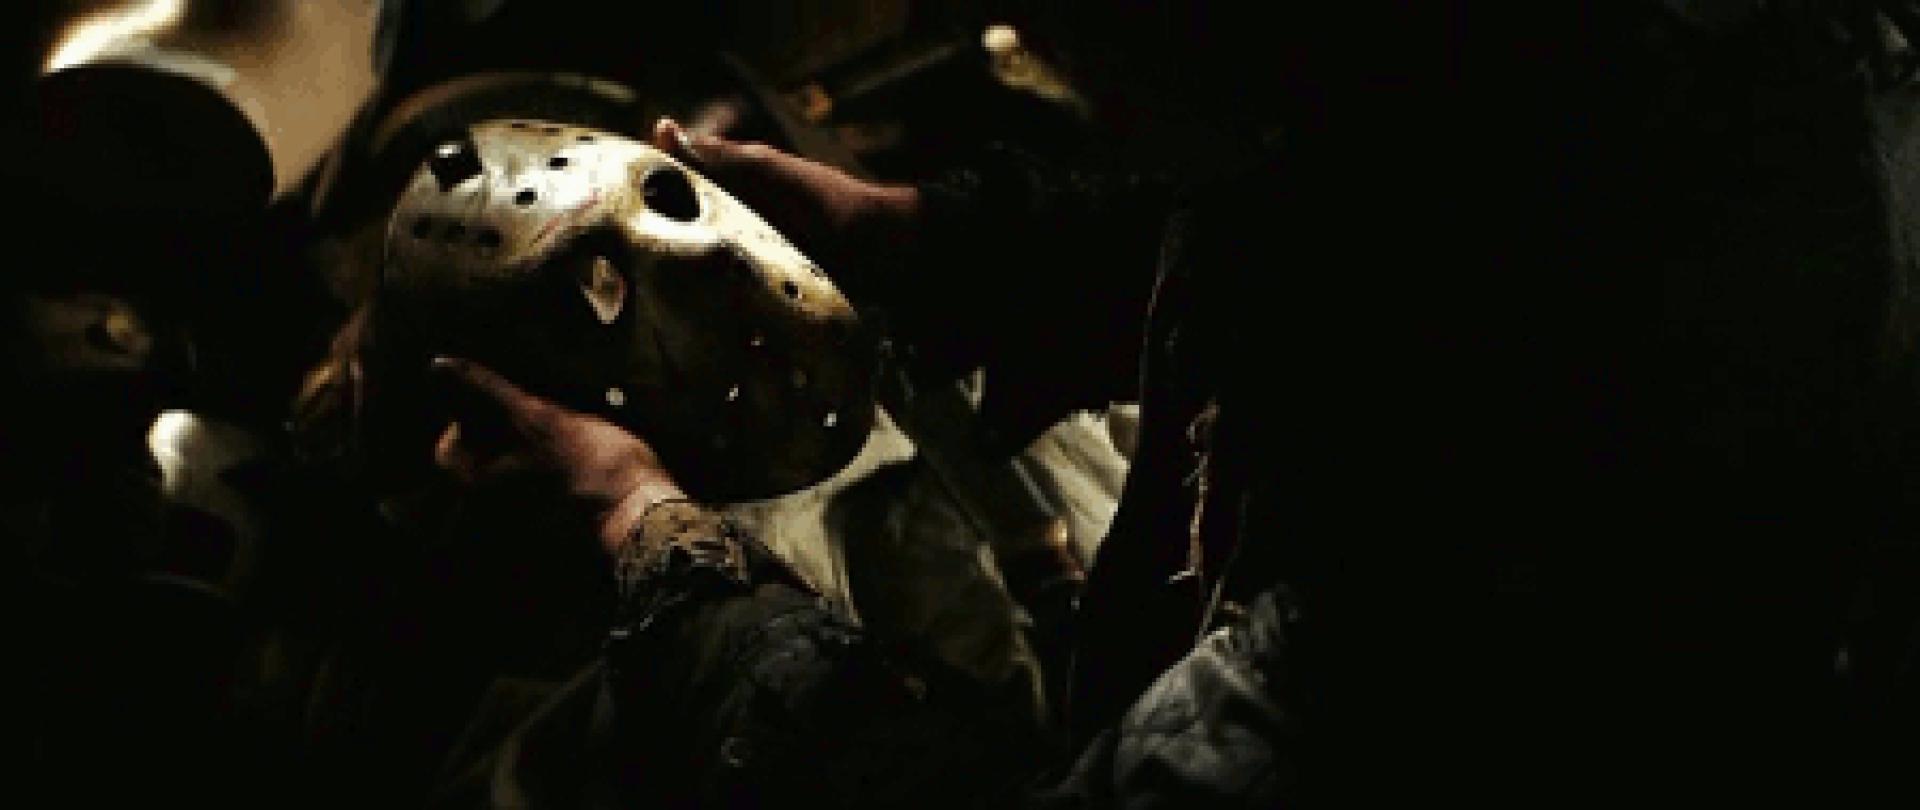 Friday the 13th - Péntek 13 (2009) 1. kép